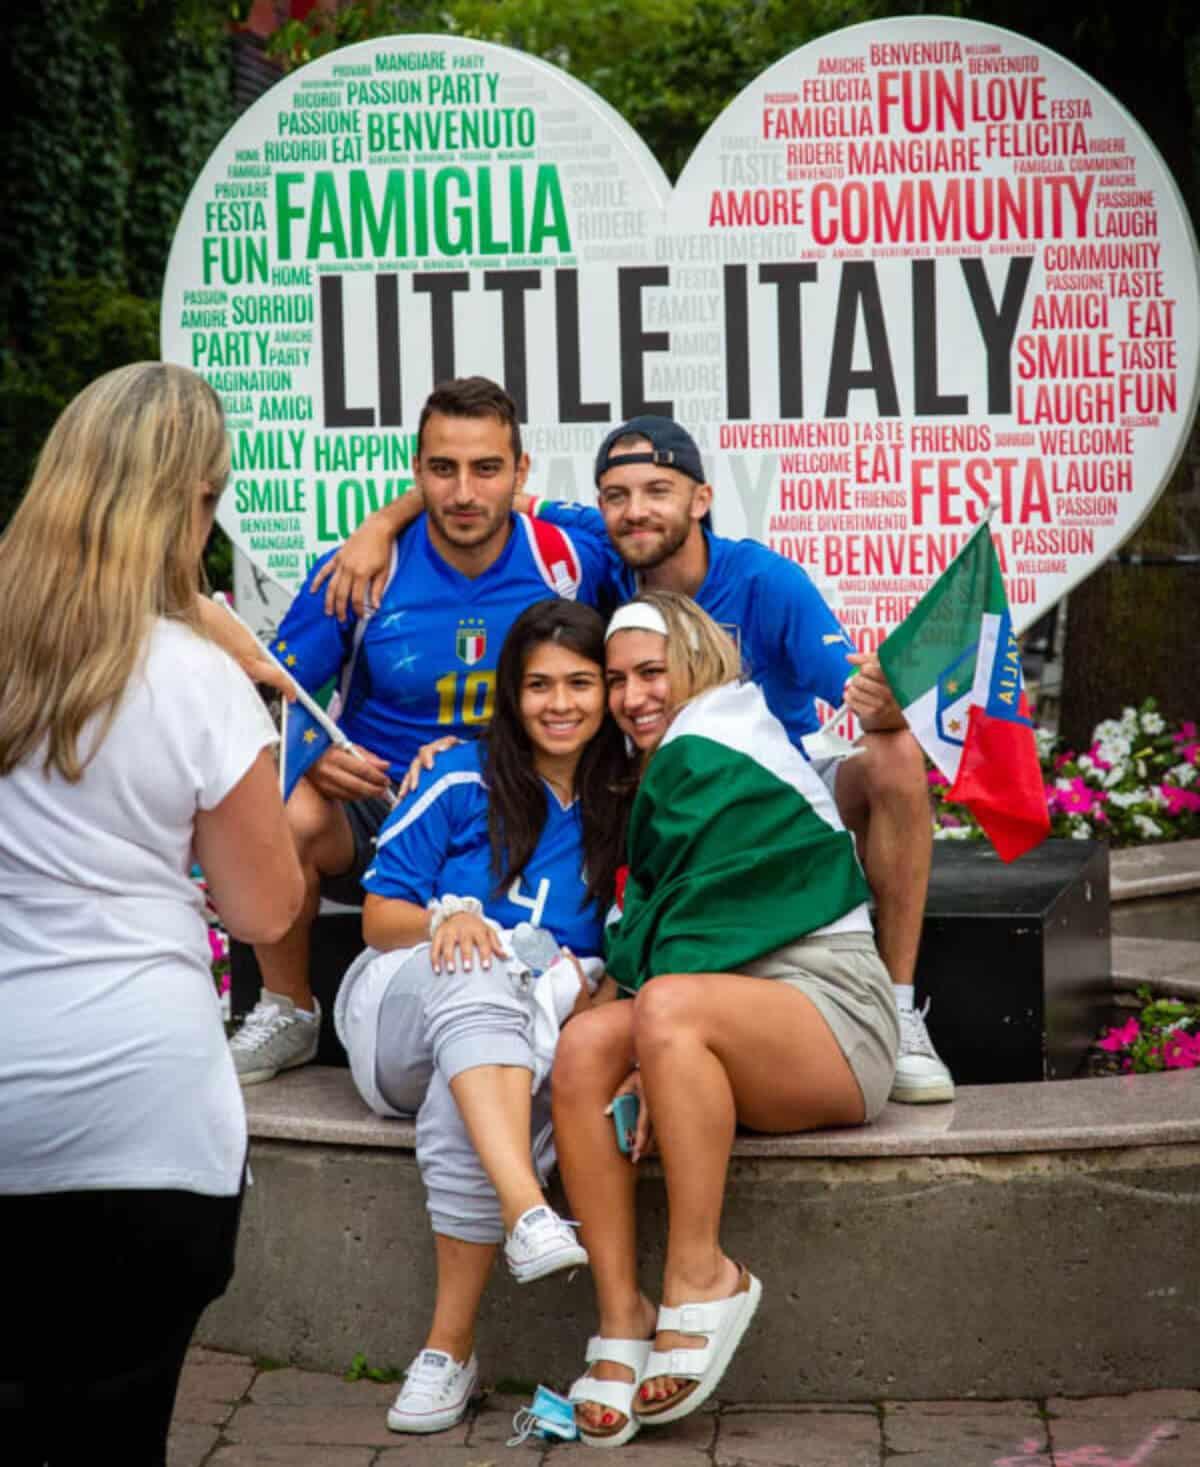 Passport to La Dolce Vita - Image 1 - Outdoor Media Works